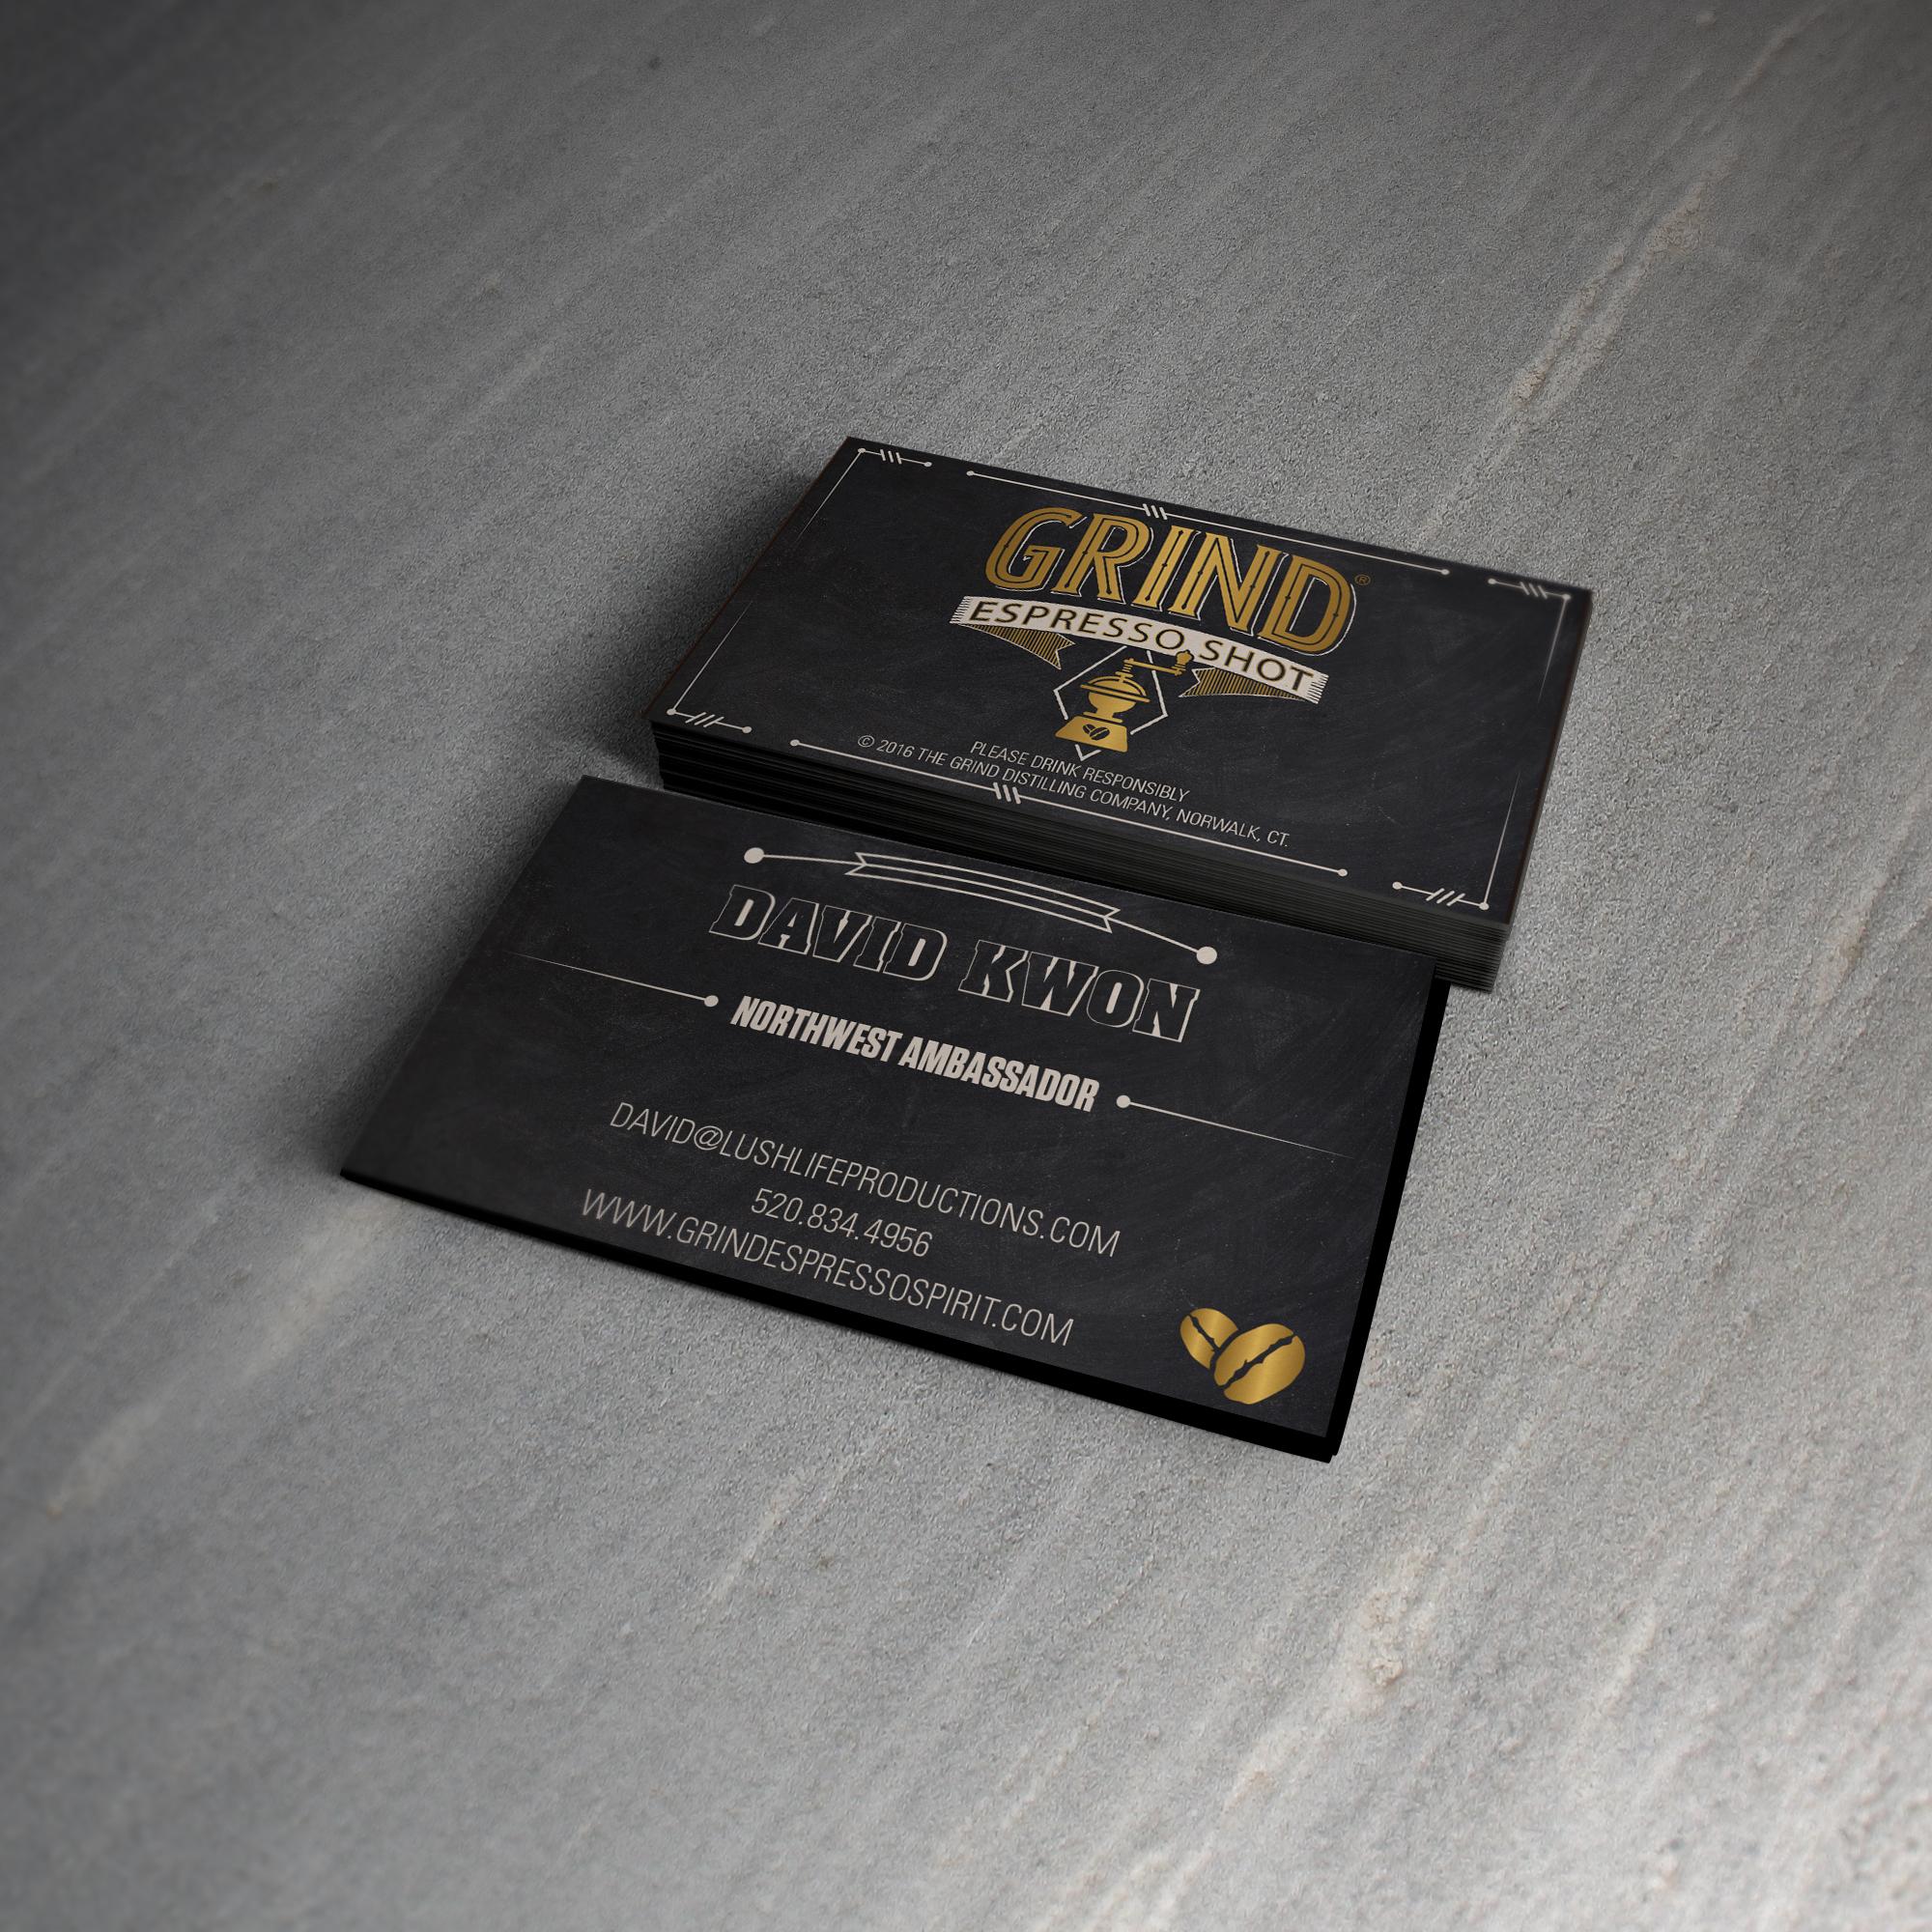 Grind Espresso Ambassador Cards